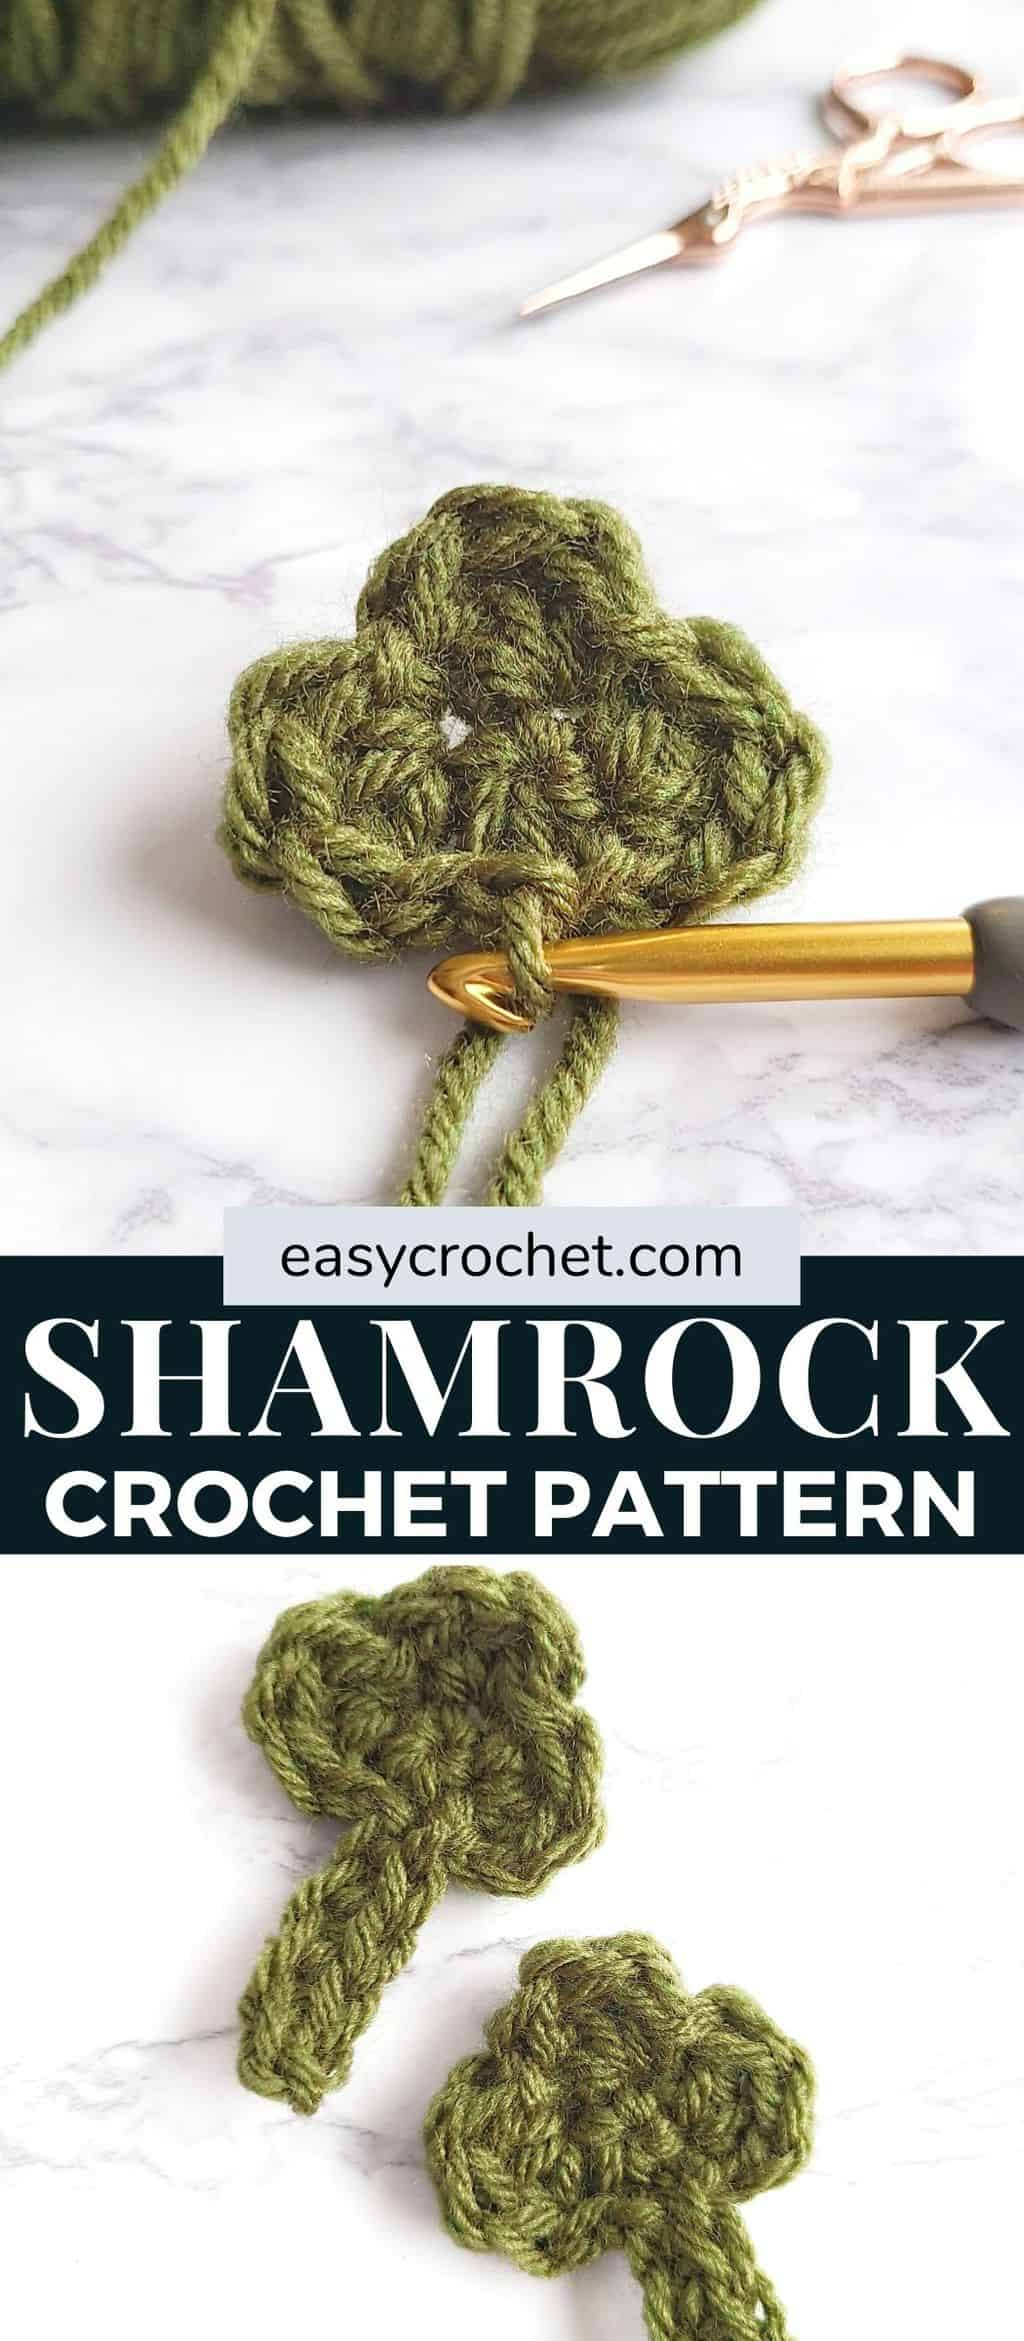 shamrock three leaf design crochet pattern